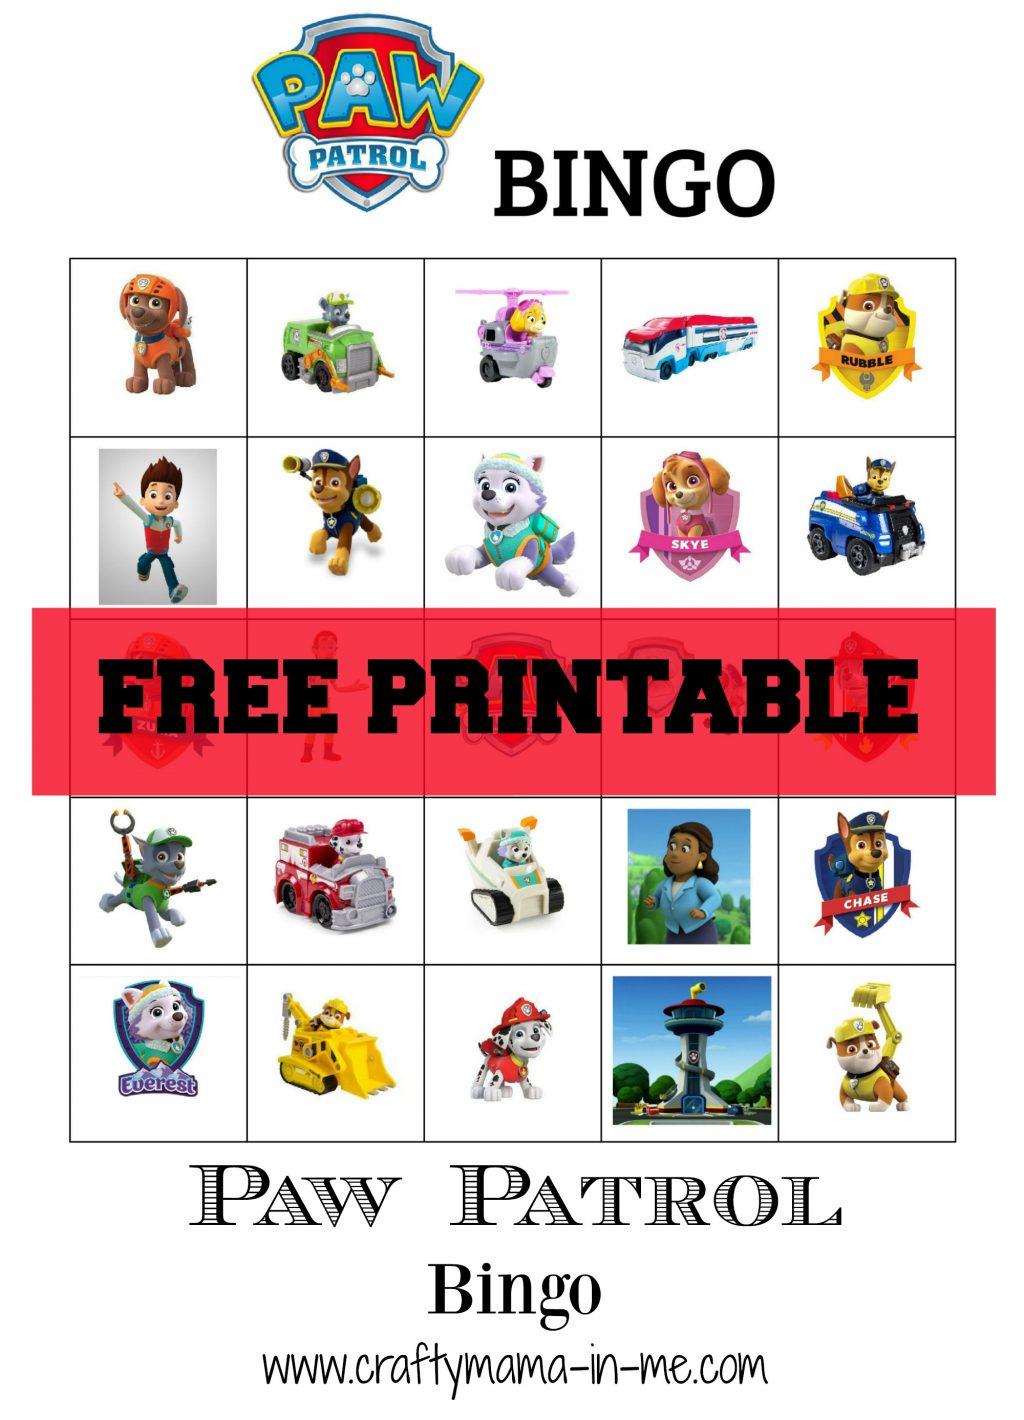 Free Printable Paw Patrol Bingo Crafty Mama In Me